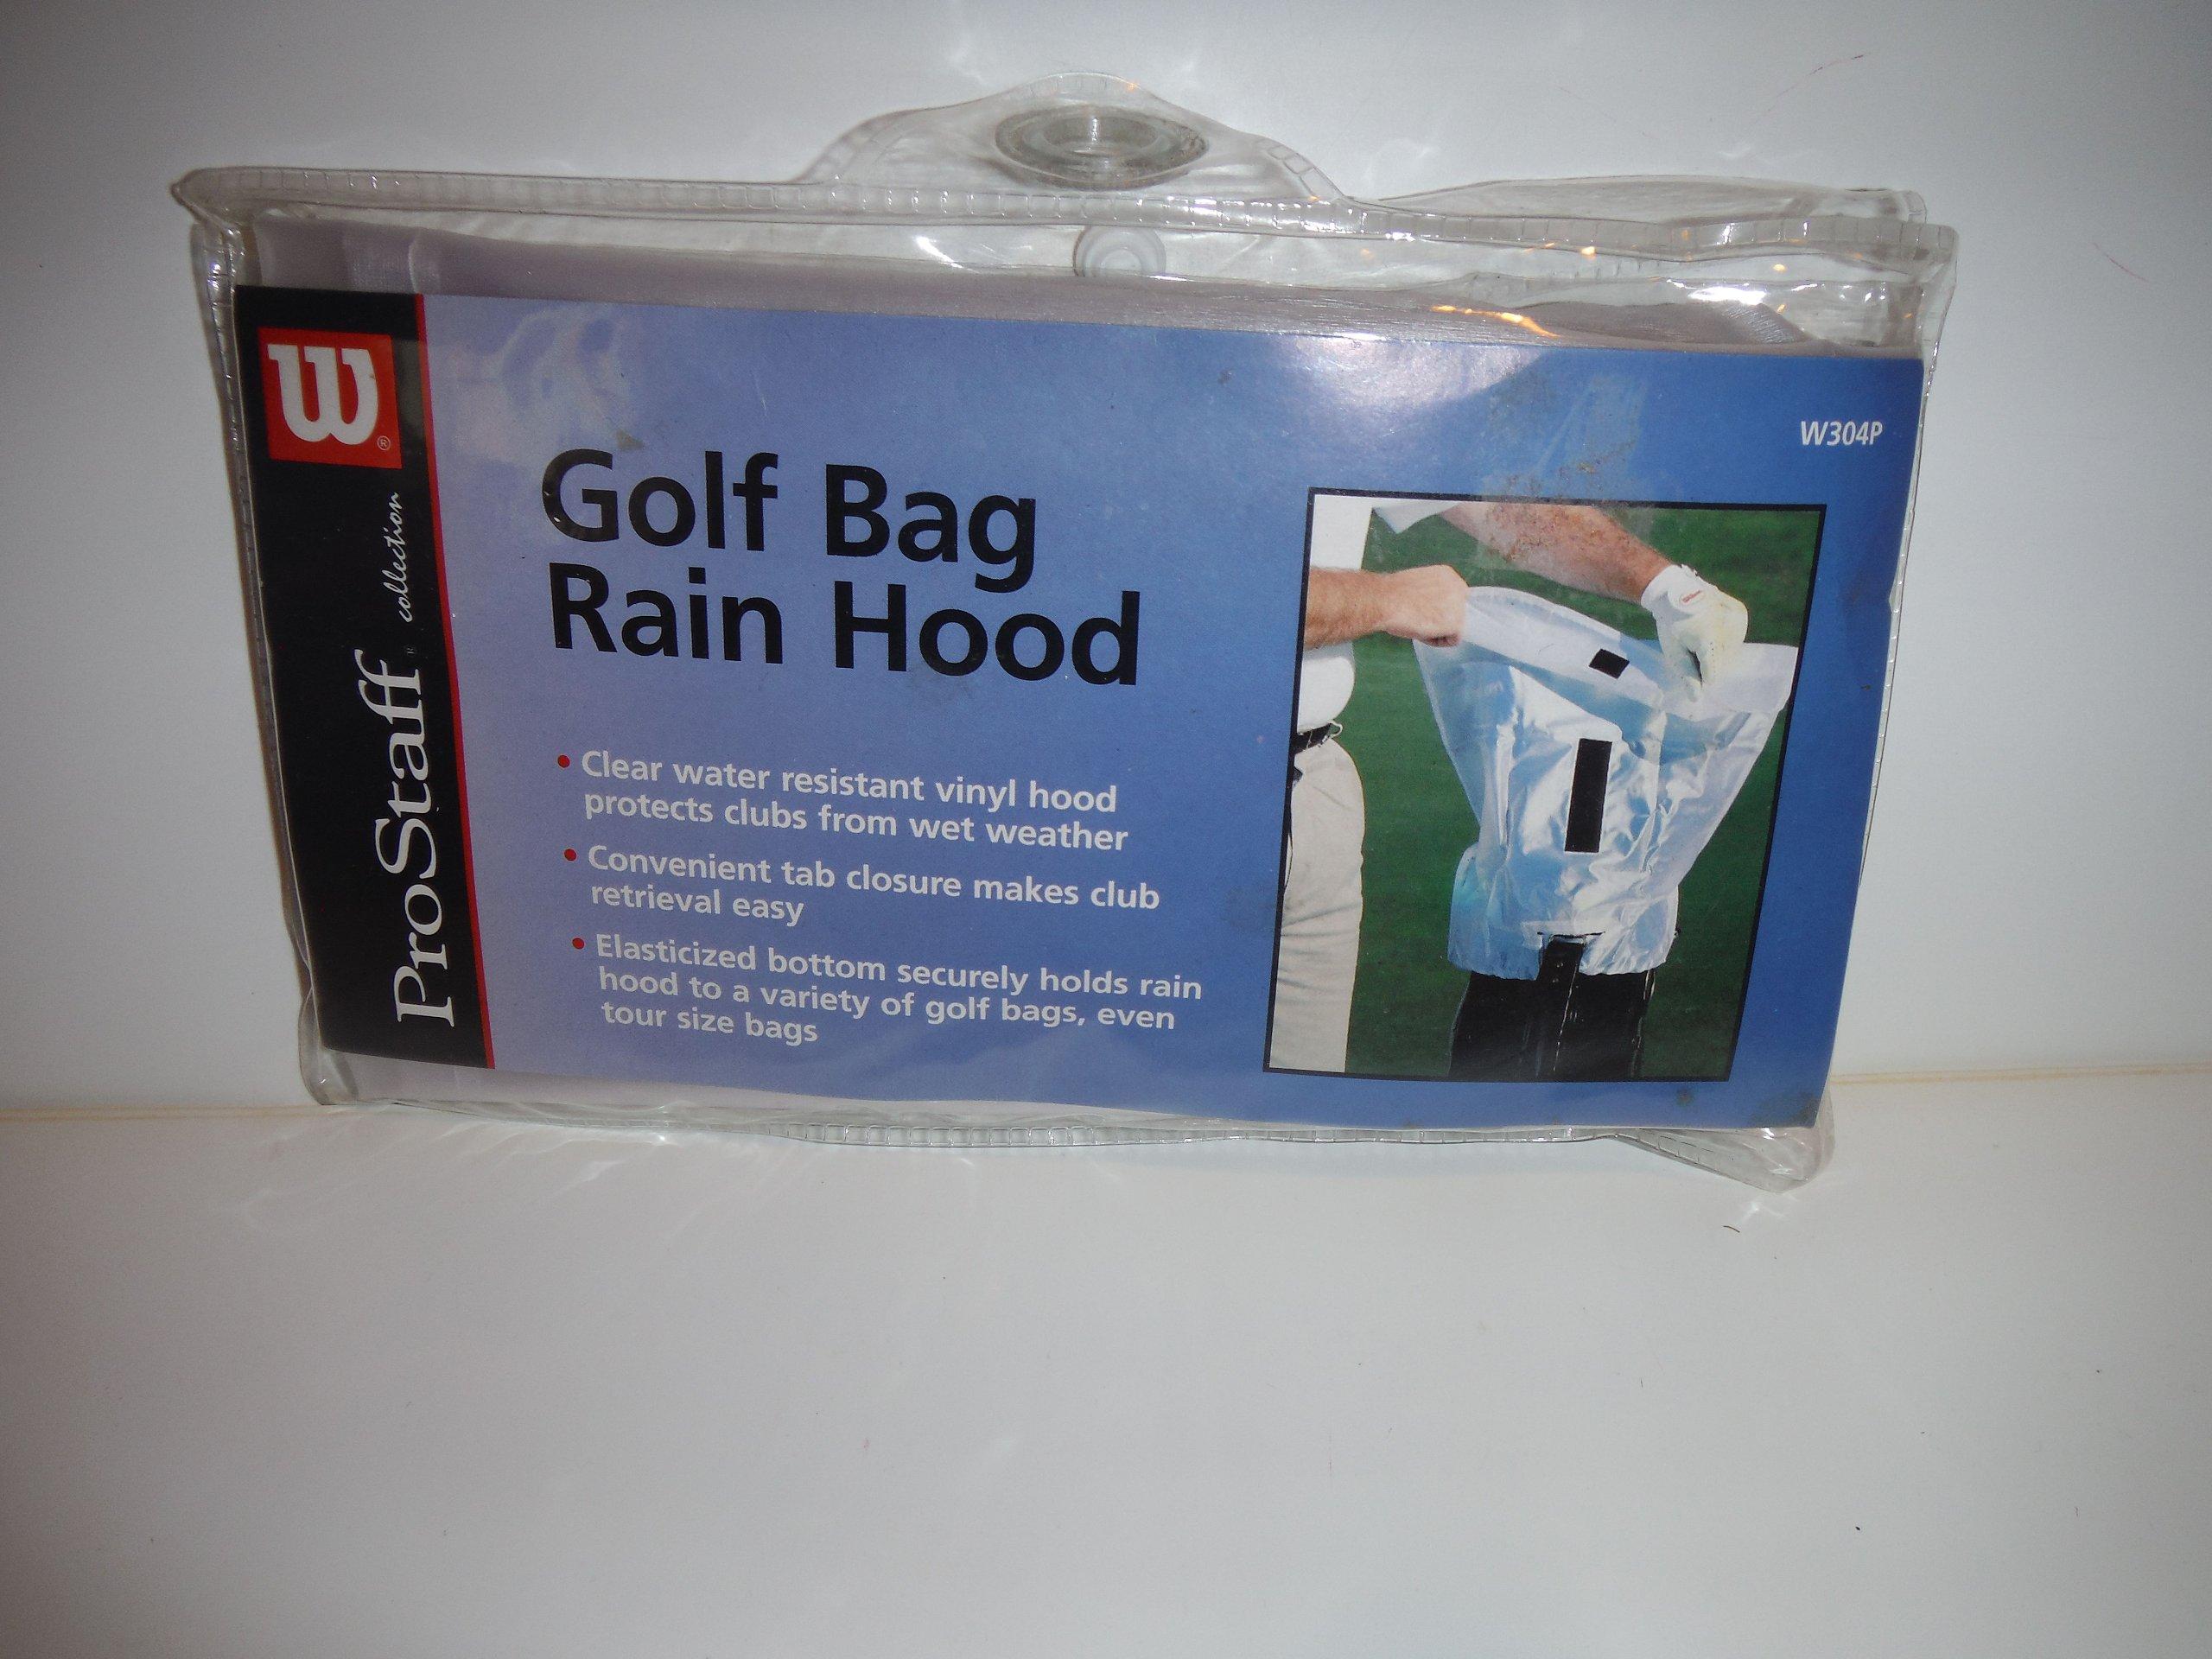 Golf Bag Rain Hood